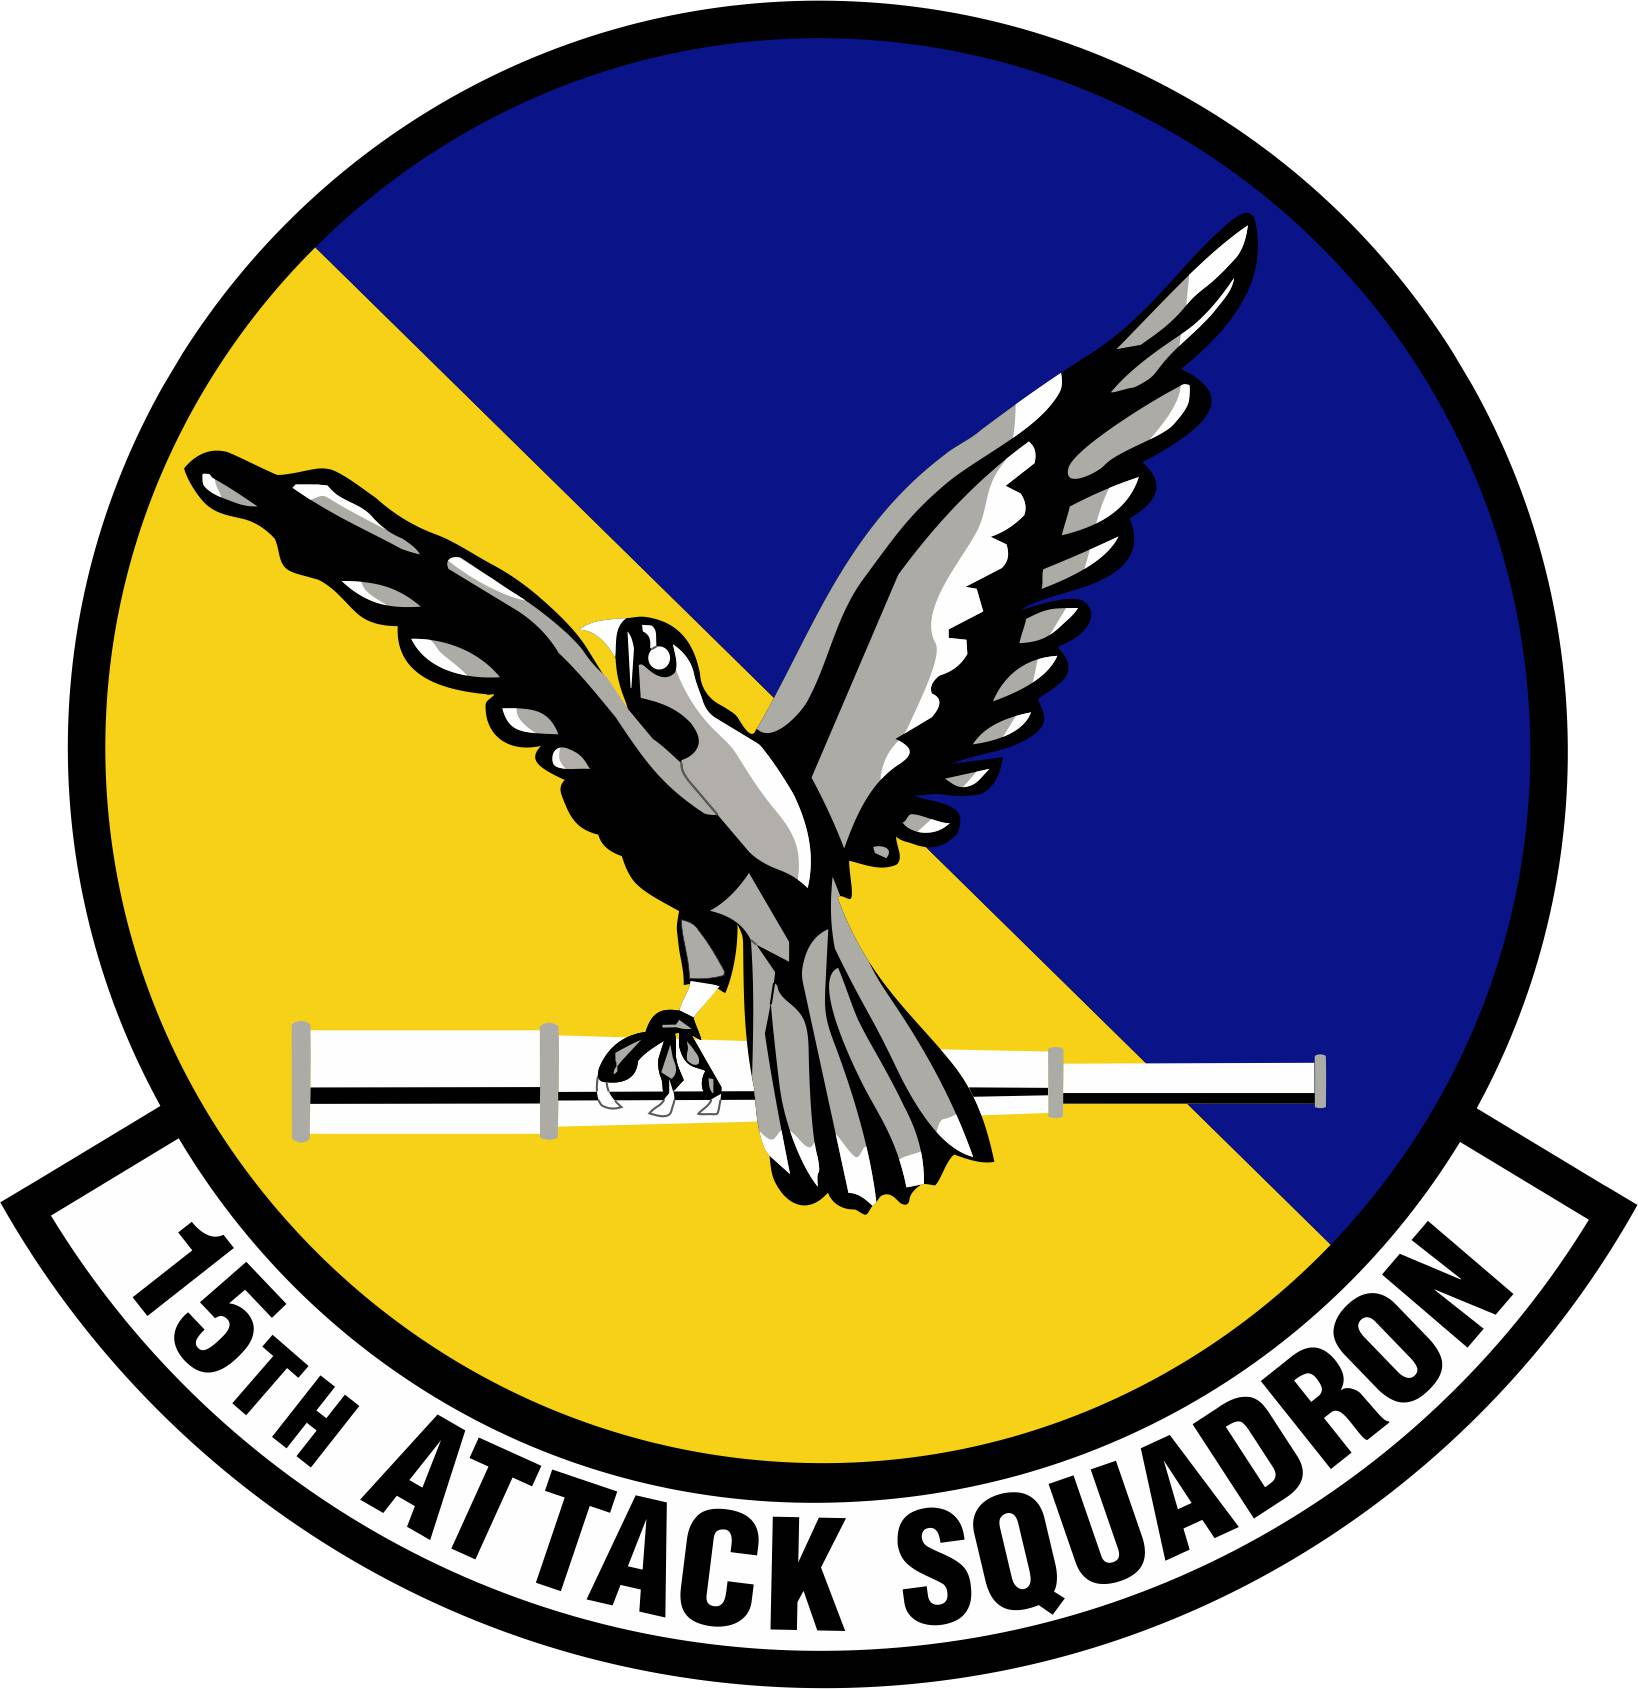 15th Reconnaissance Squadron (disambiguation)